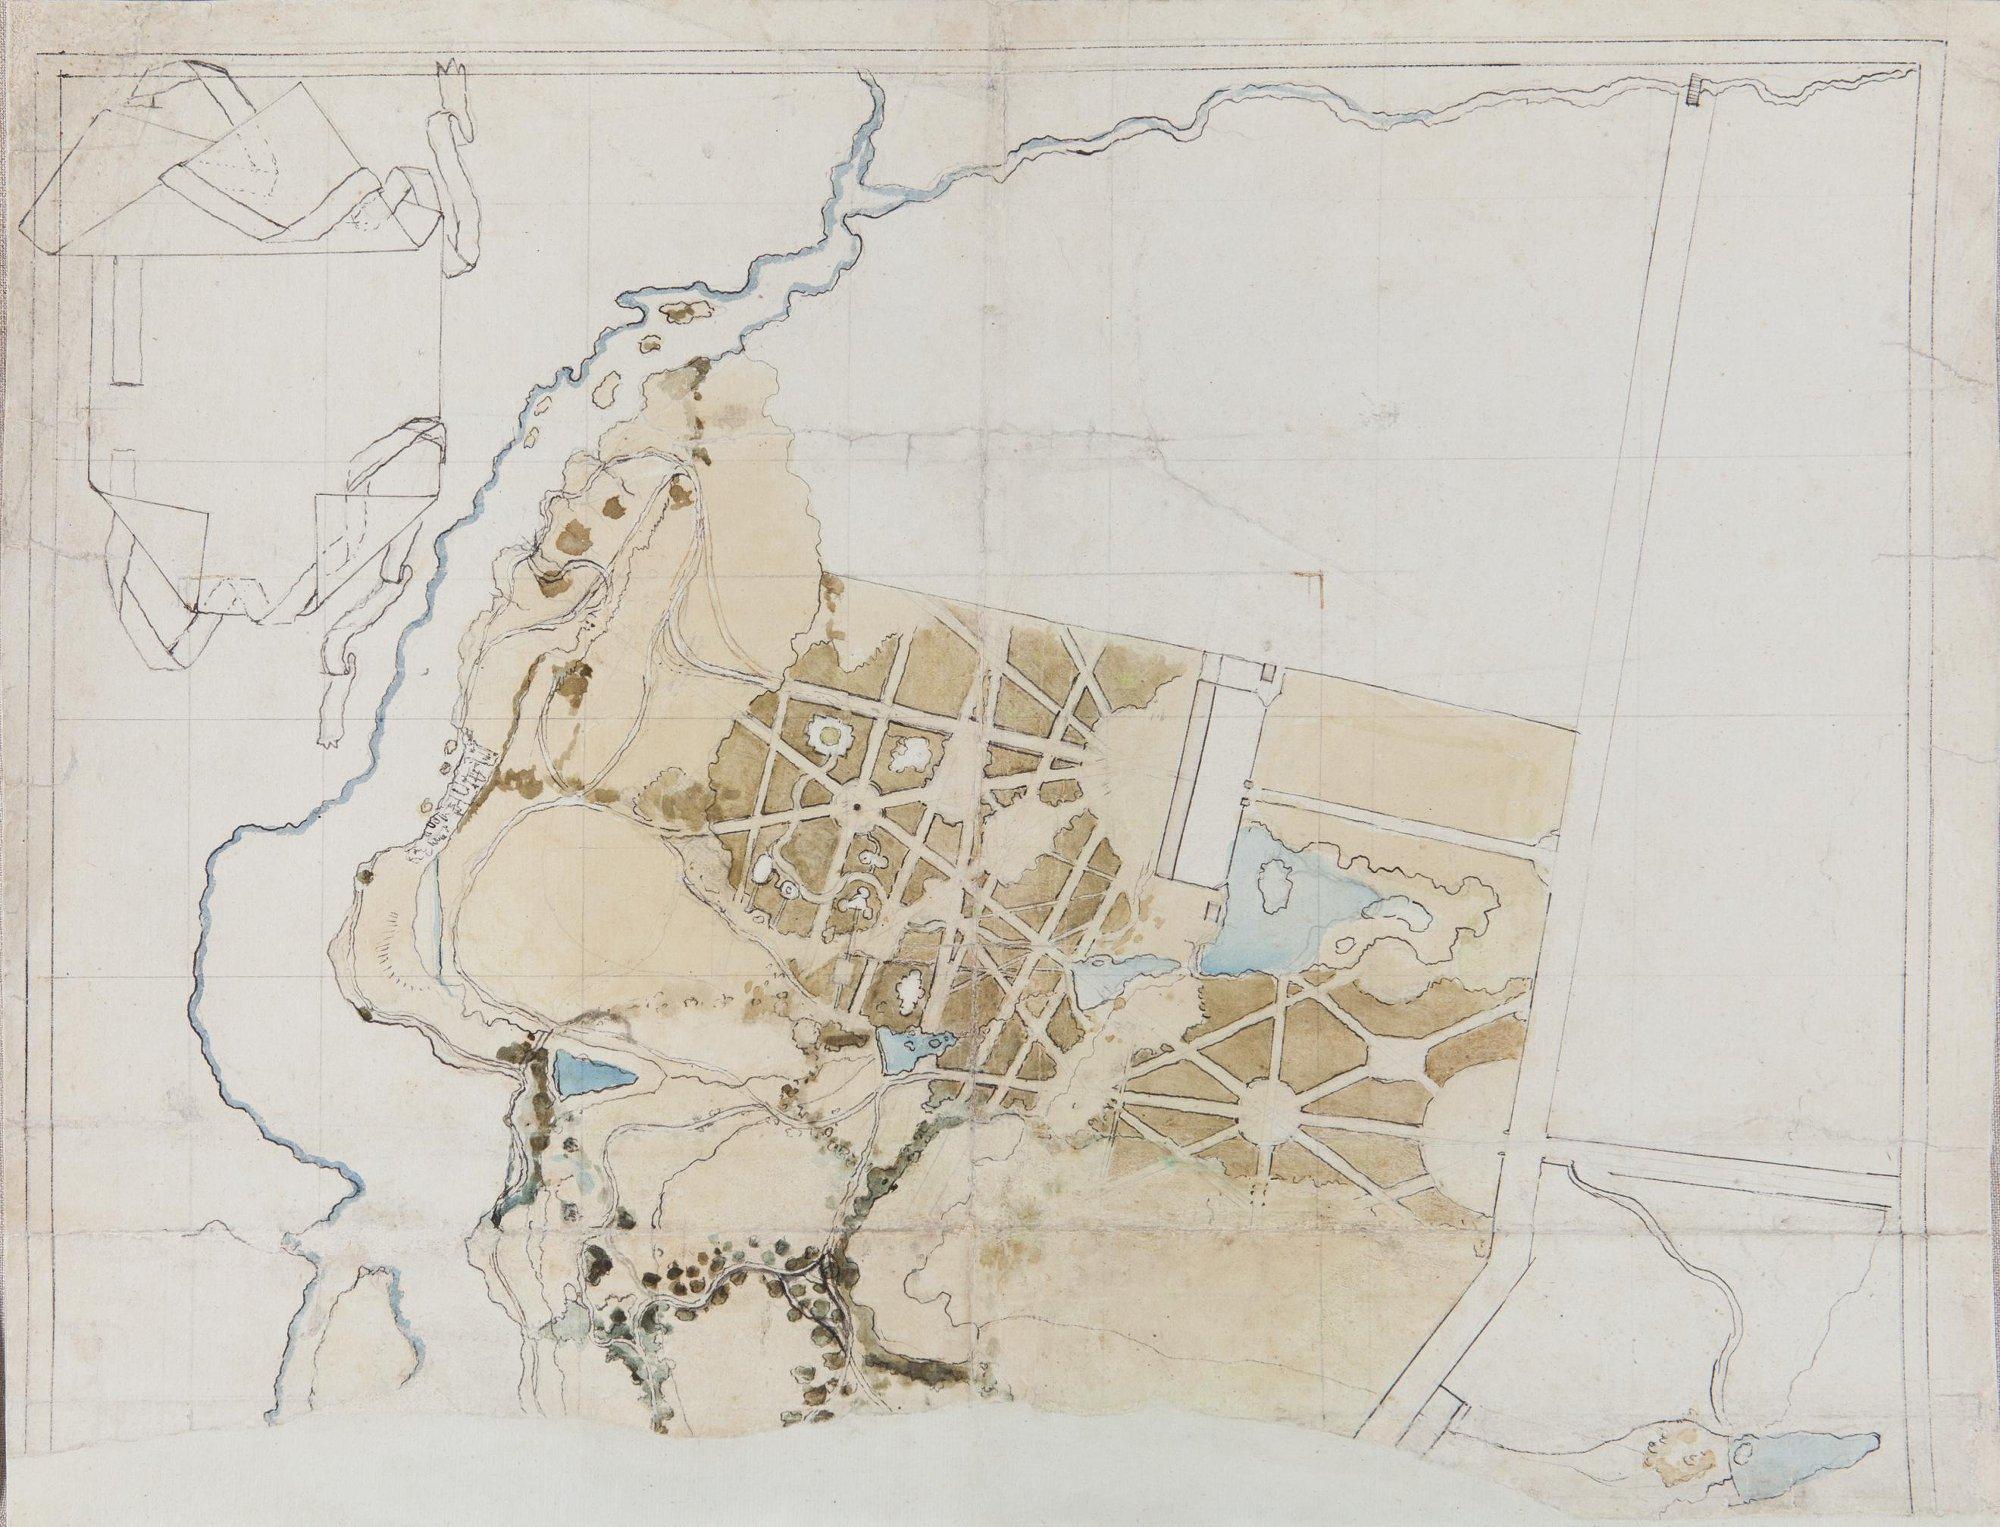 План Богородицкого парка. Правая половина